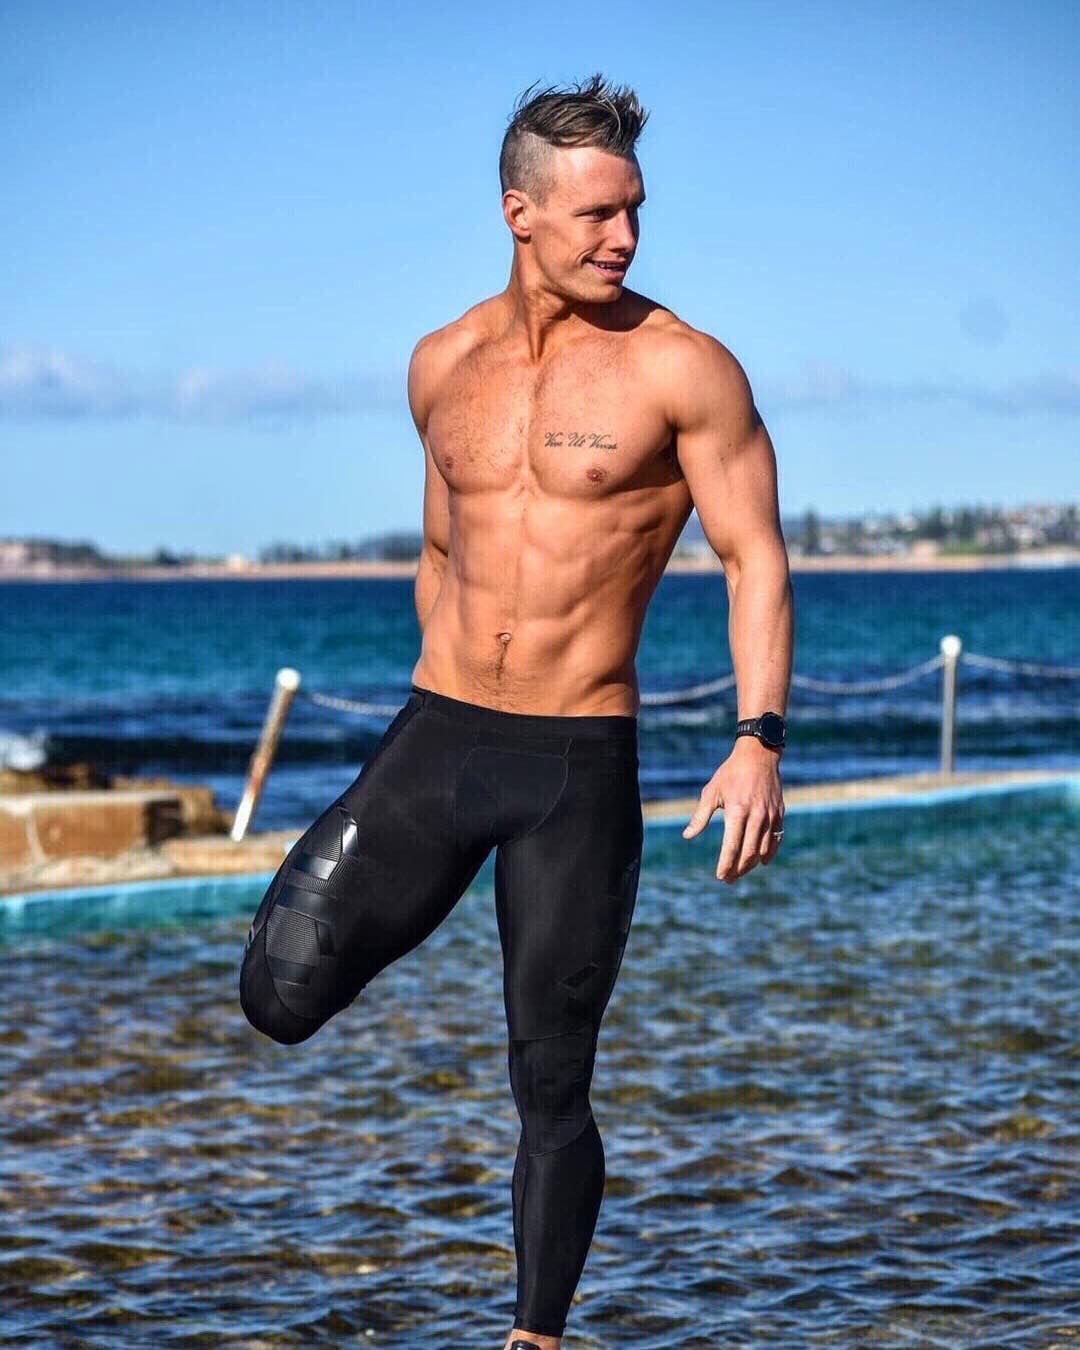 Get Fit For Life Not For The Season Lycra Men Fit Men Bodies Shirtless Men